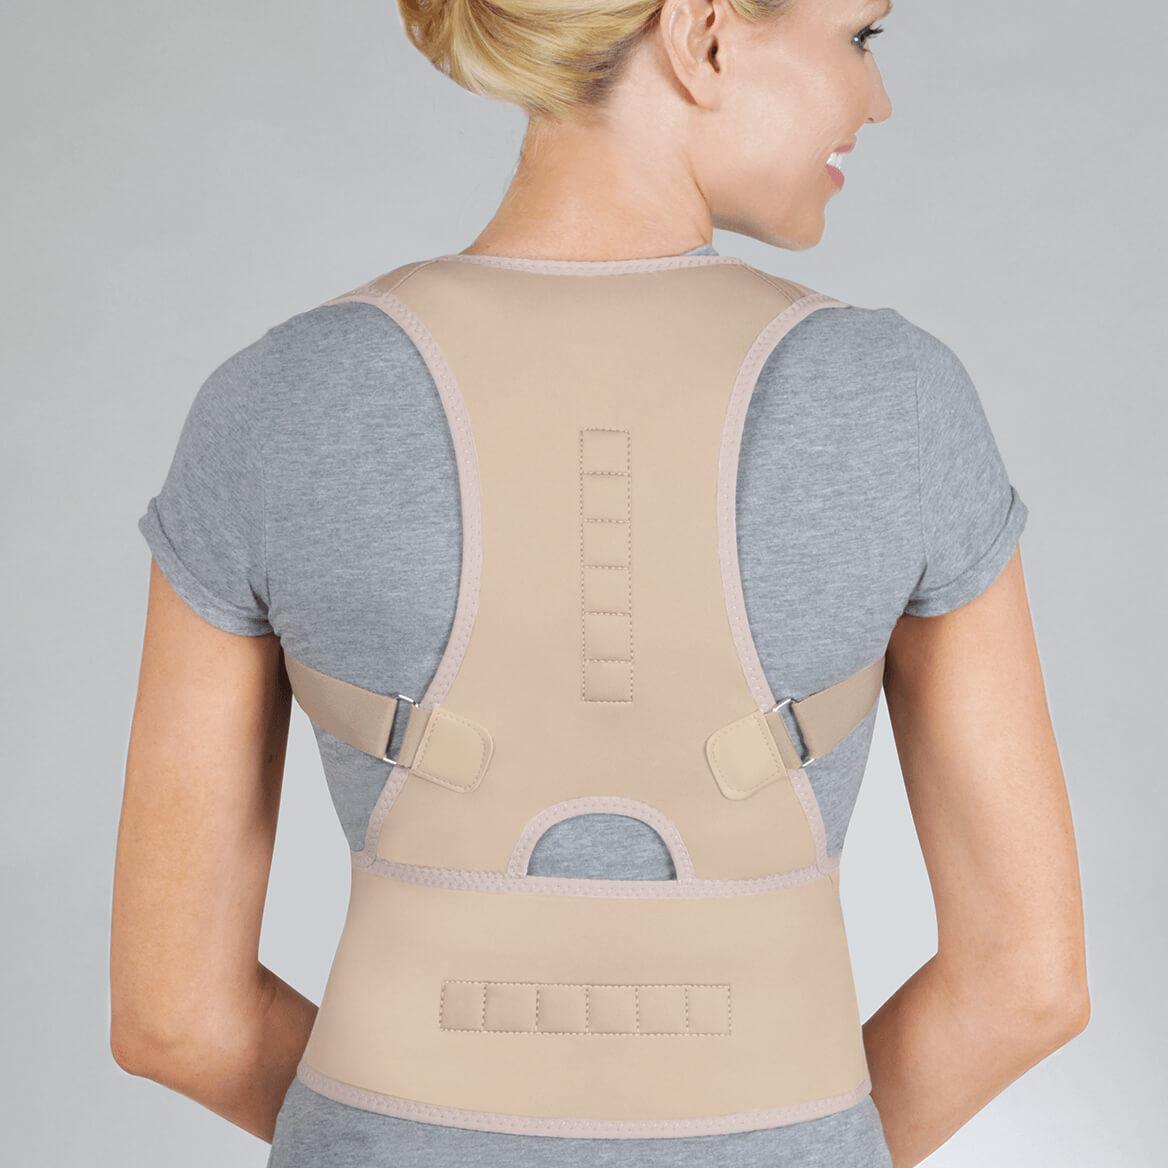 Magnetic Posture Corrector-350099